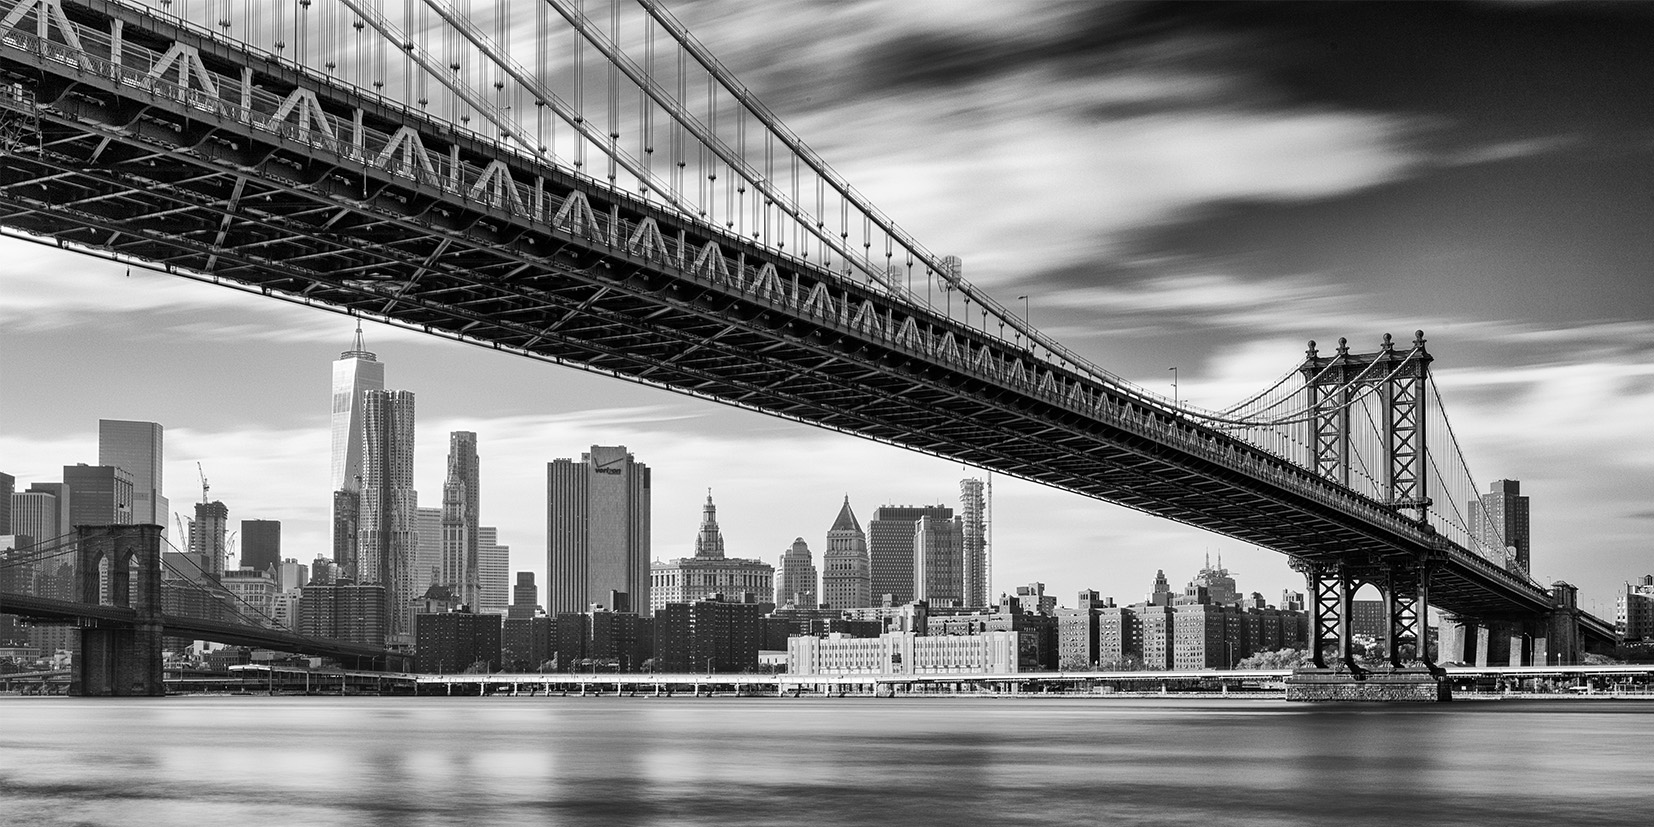 Manhattan Bridge<br> New York 2015